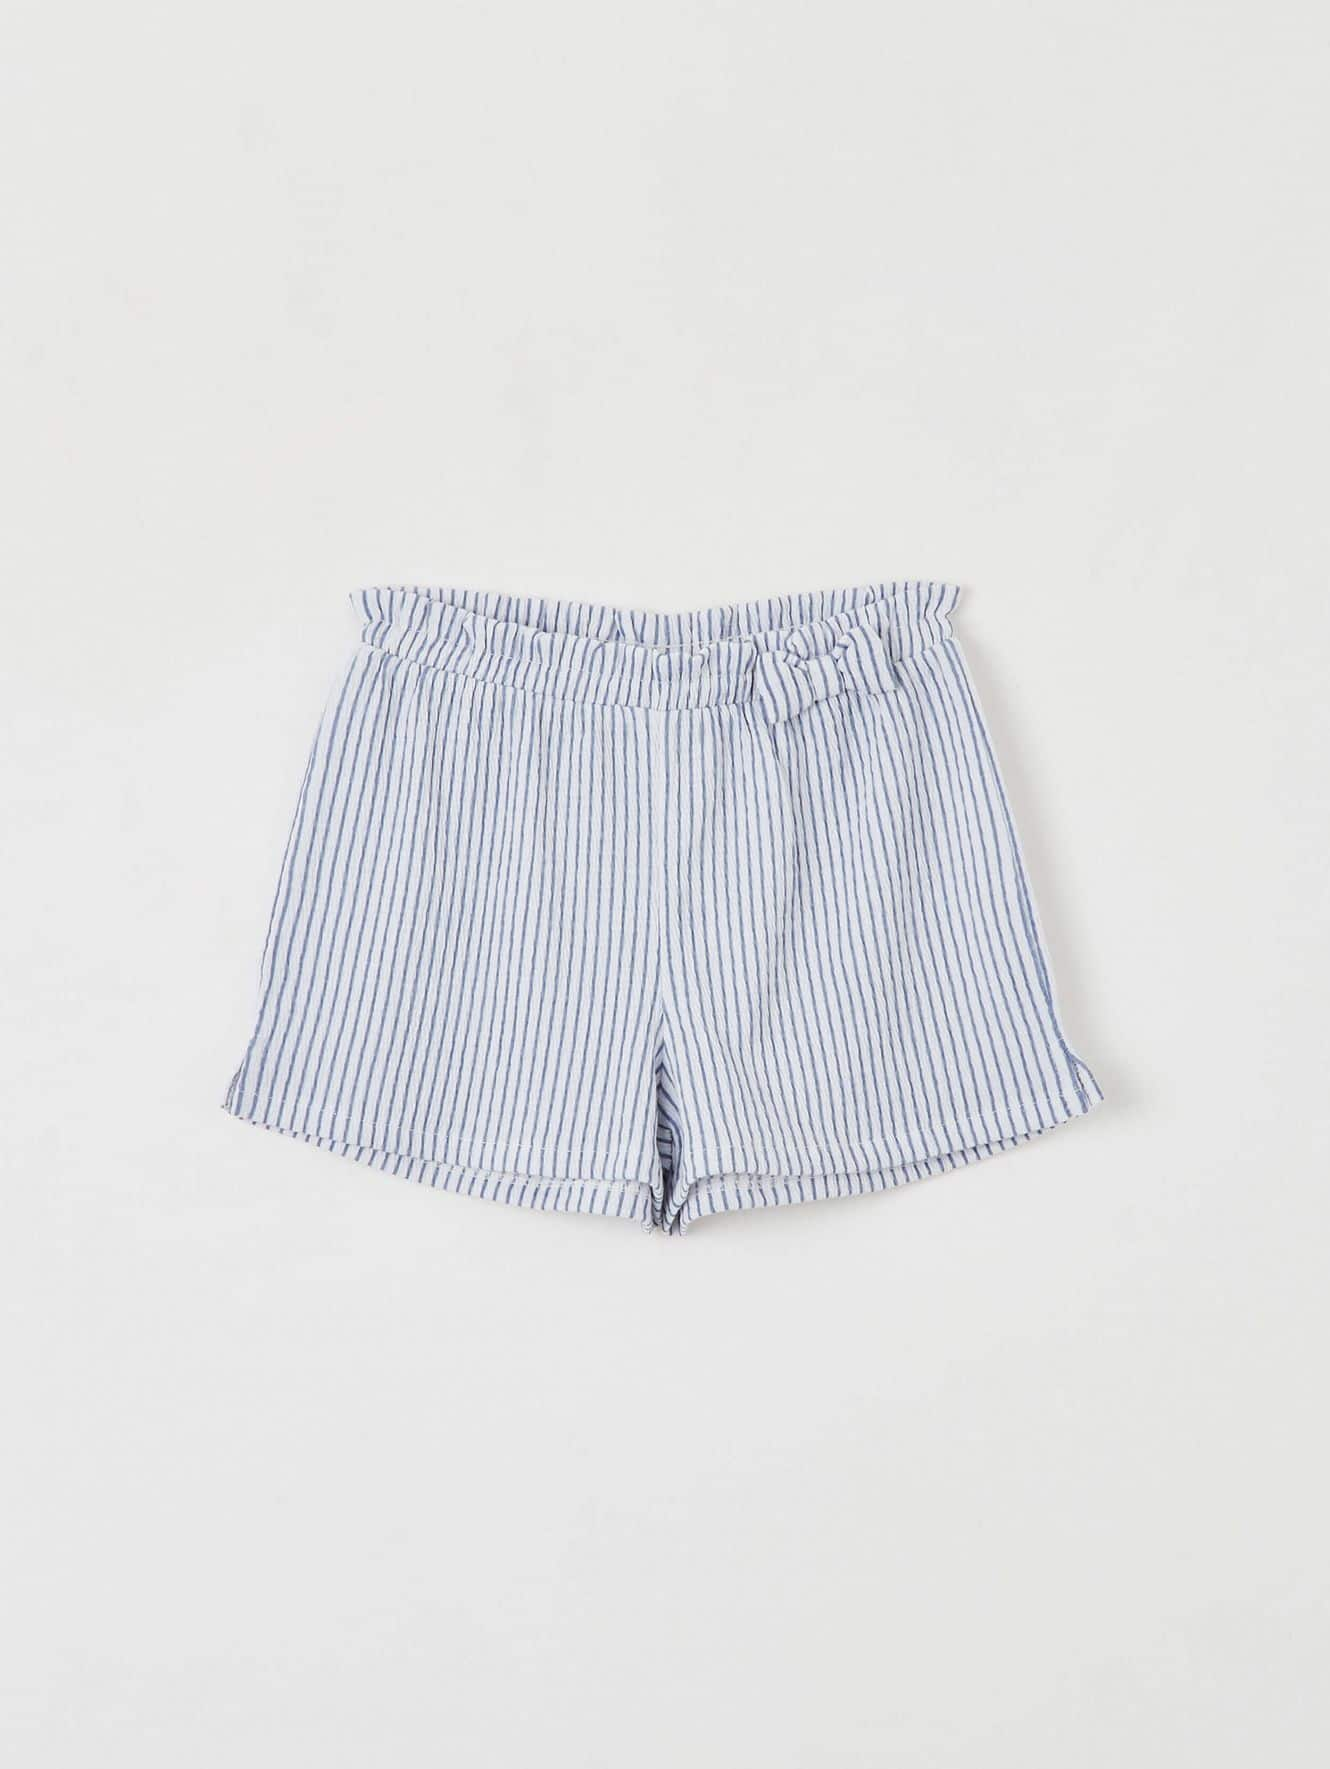 Pantalone Corto bebè Terranova